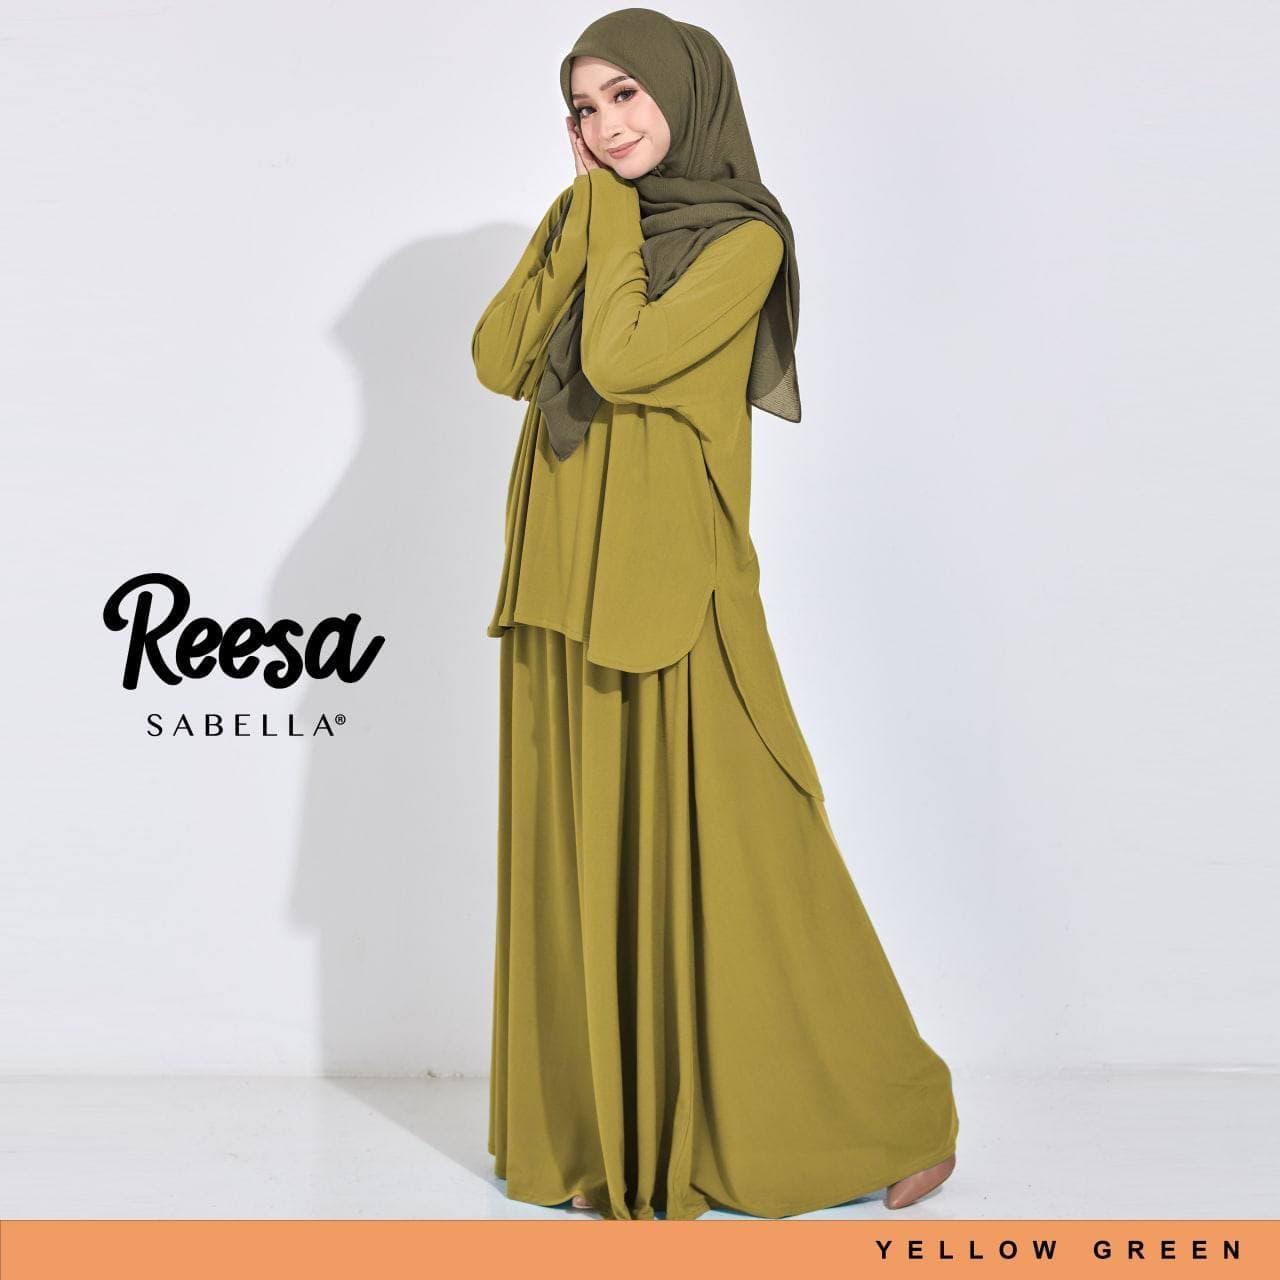 Reesa 4.0 Yellow Green